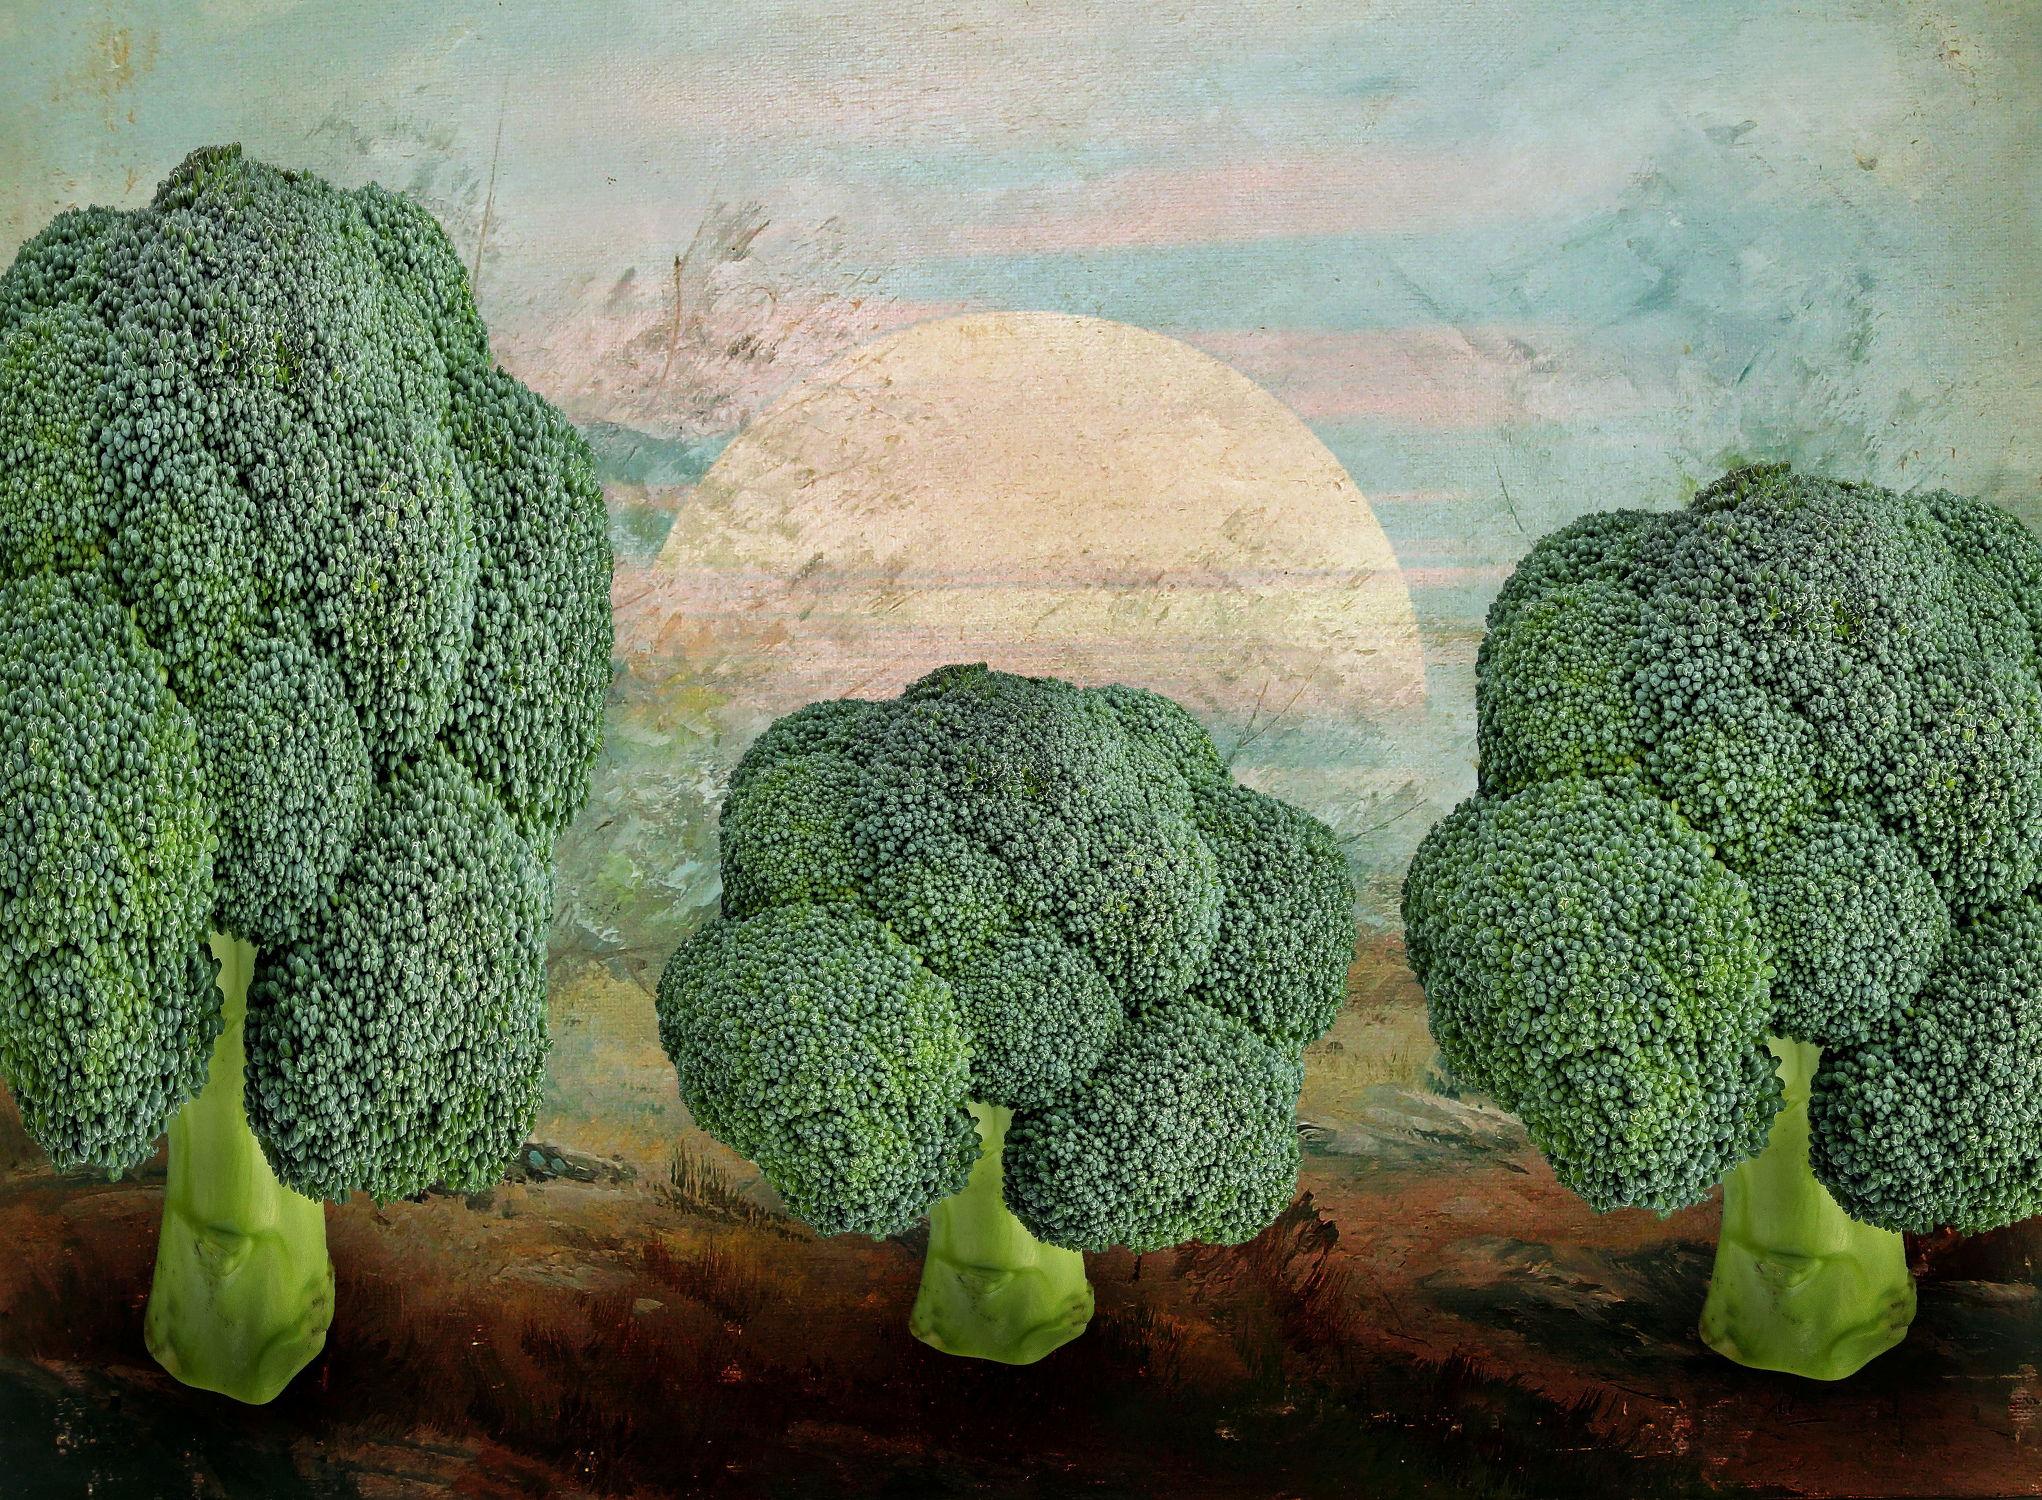 Bild mit Natur, Himmel, Wolken, Essen, Sonnenuntergang, Sonne, Gemüse, Nahrung, Abstrakt, Food, Toskana, Allee, Abstraktes, Ernährung, kochen, brokkoli